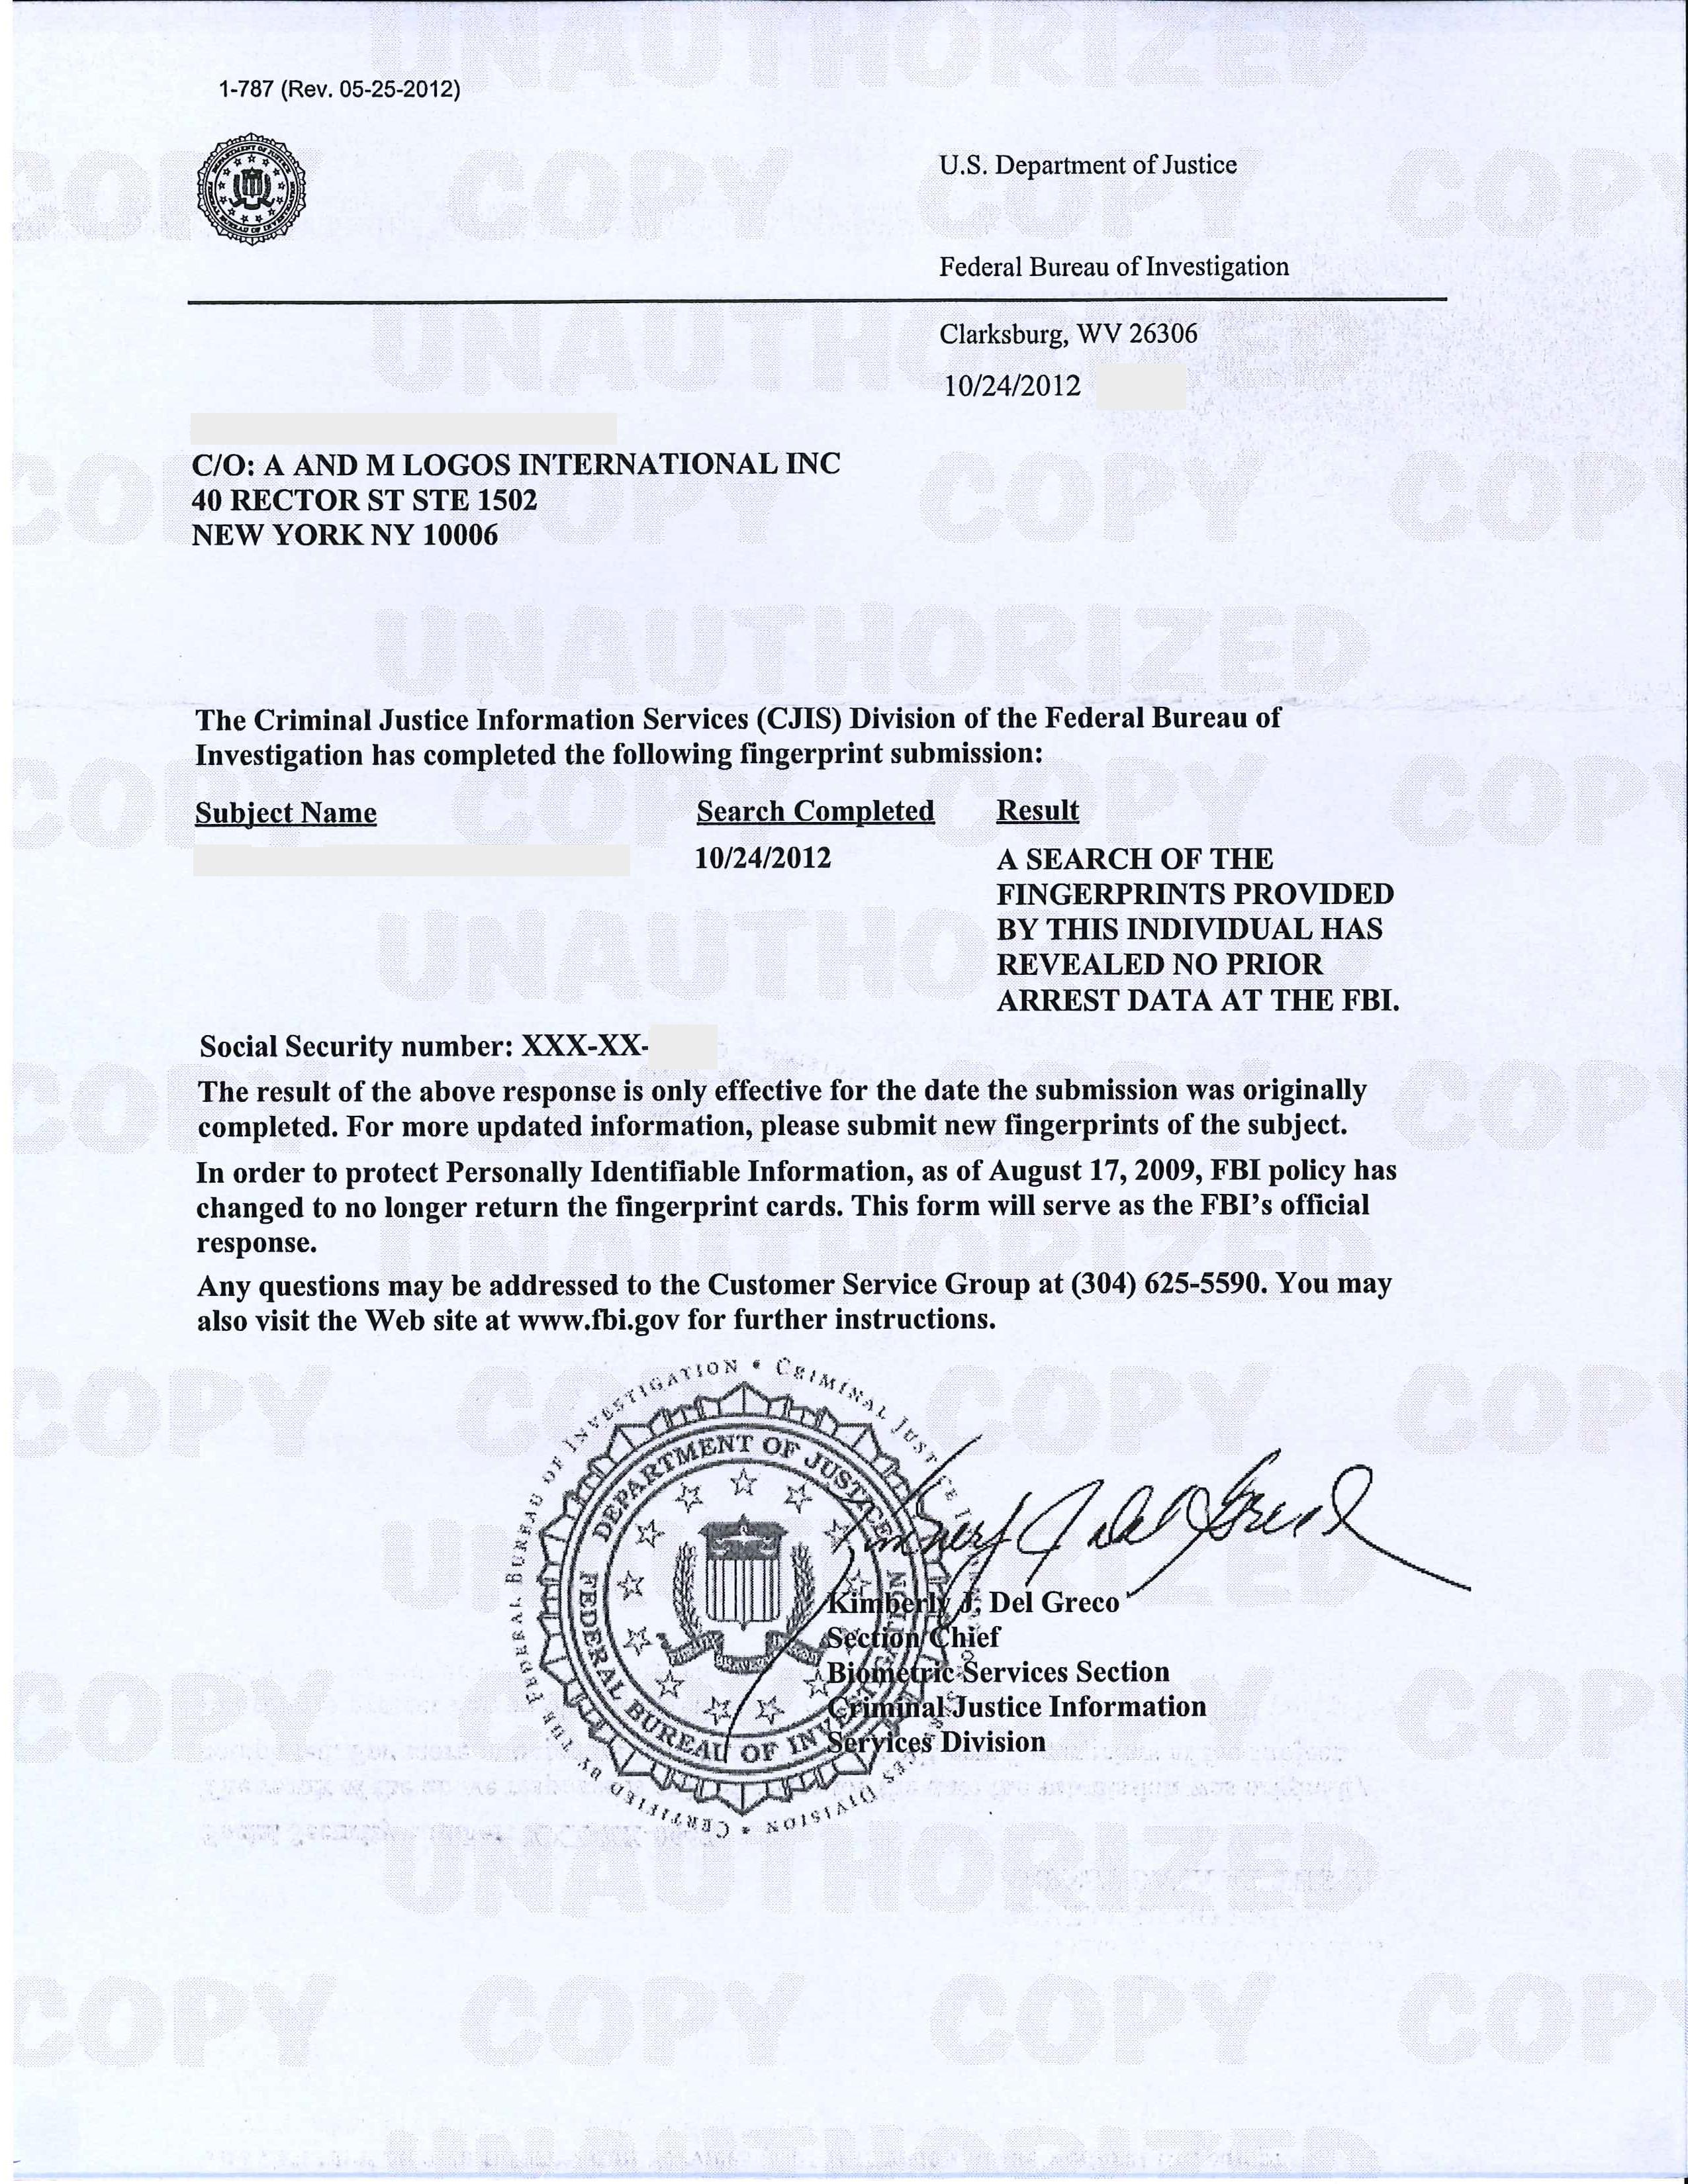 Fbi Intelligence Analyst Cover Letter - sarahepps.com -